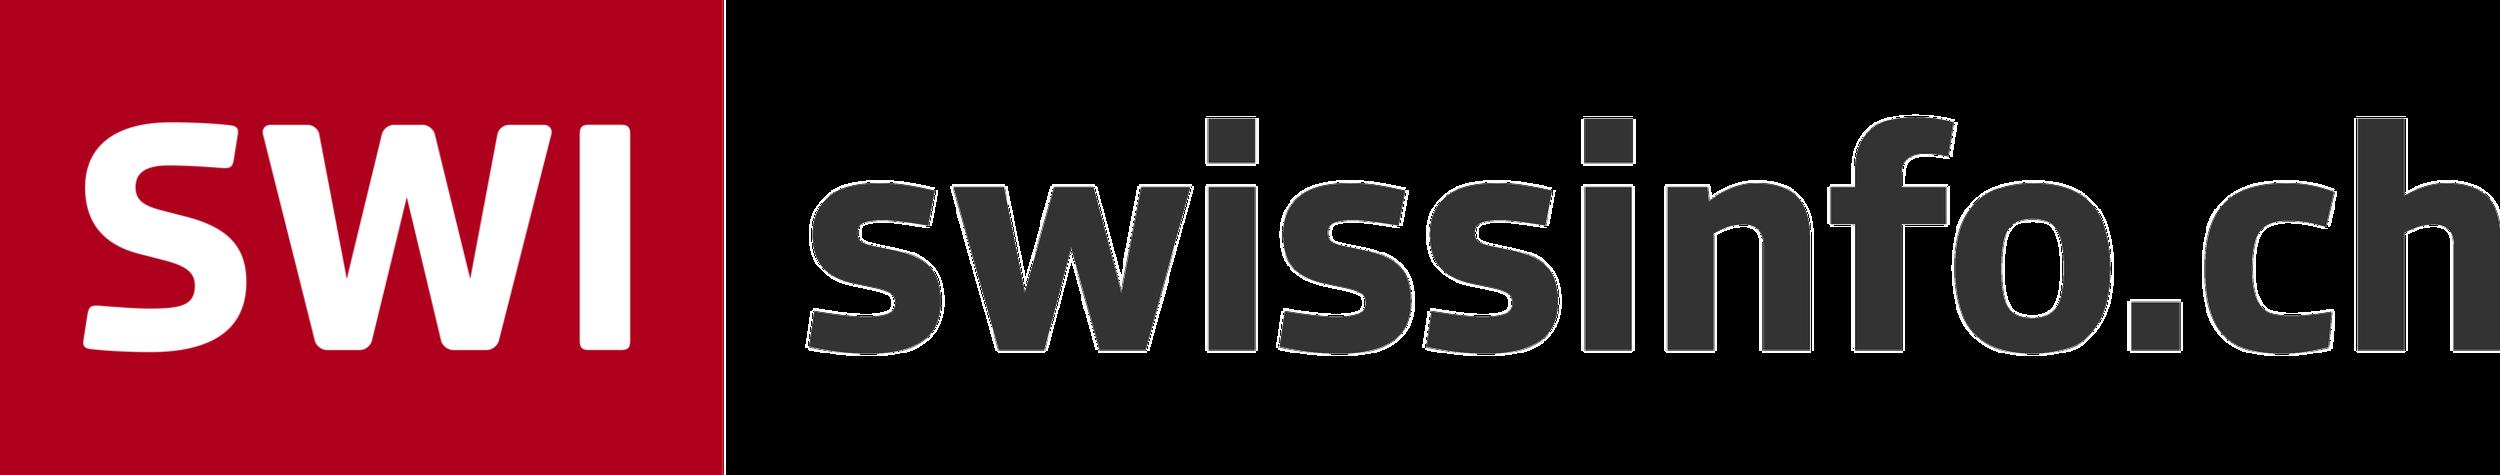 swissinfo.ch.png